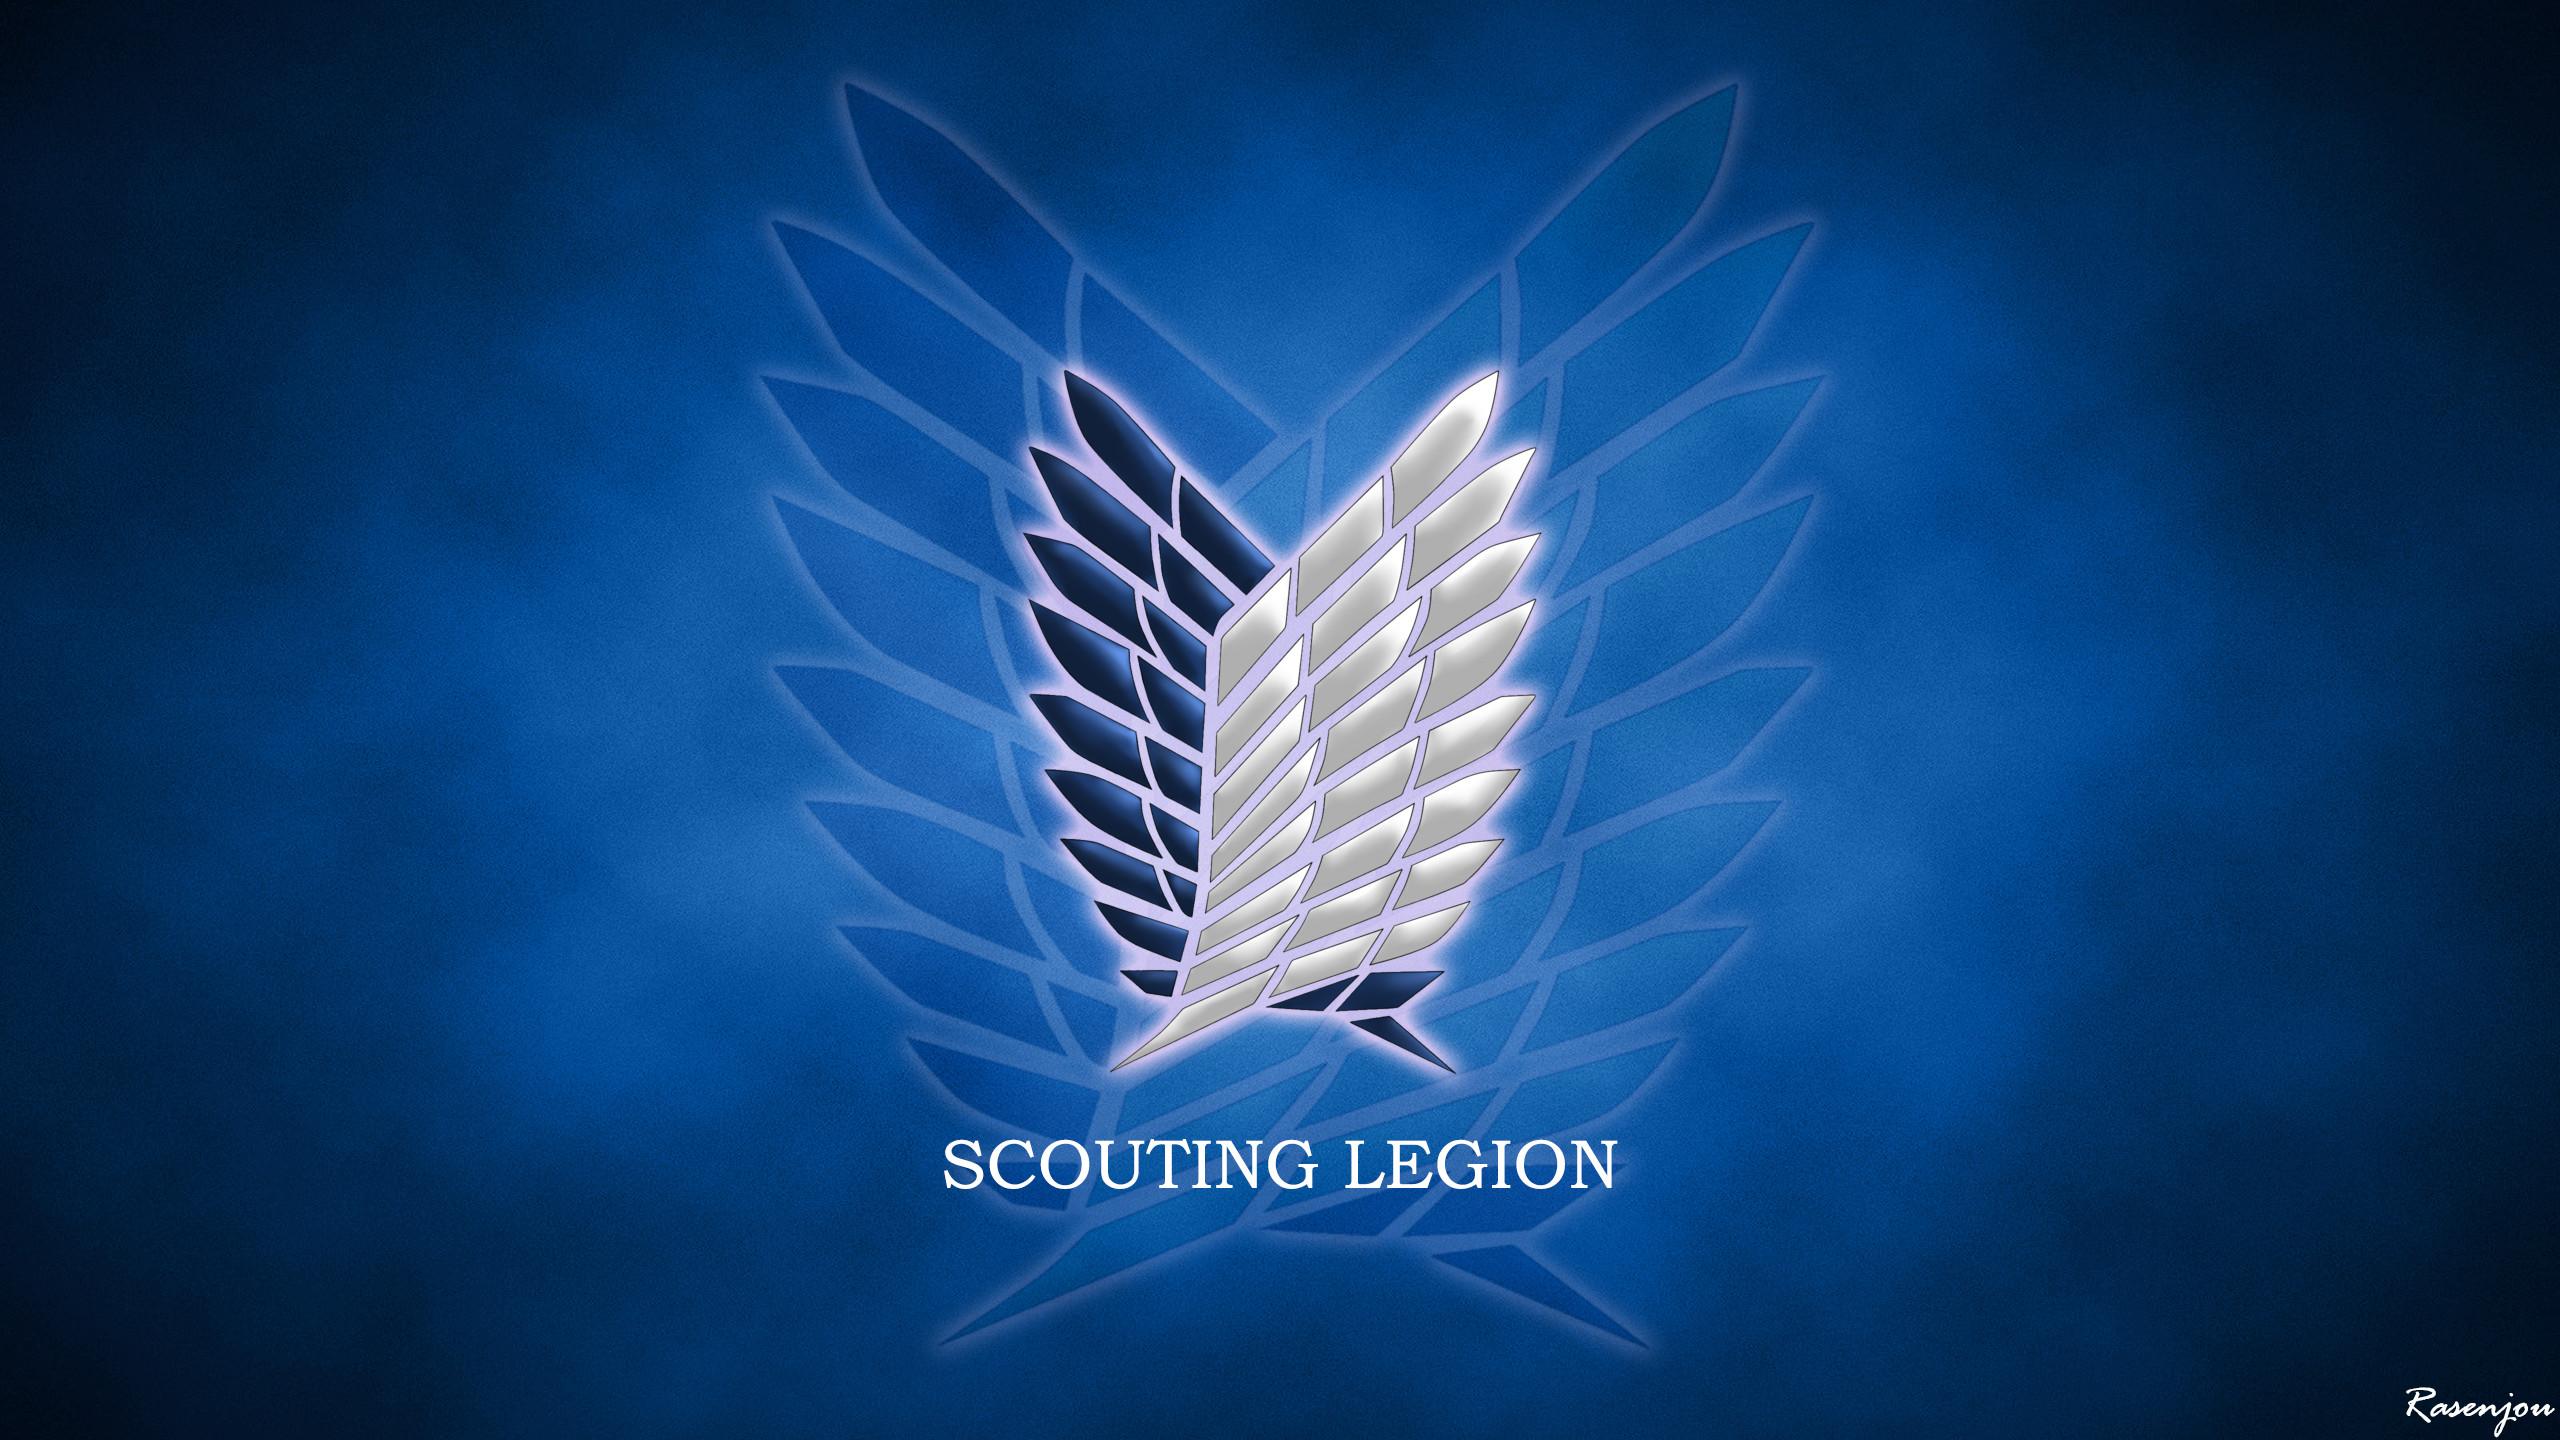 … Scouting Legion Wallpaper – Attack On Titan by rasenjou